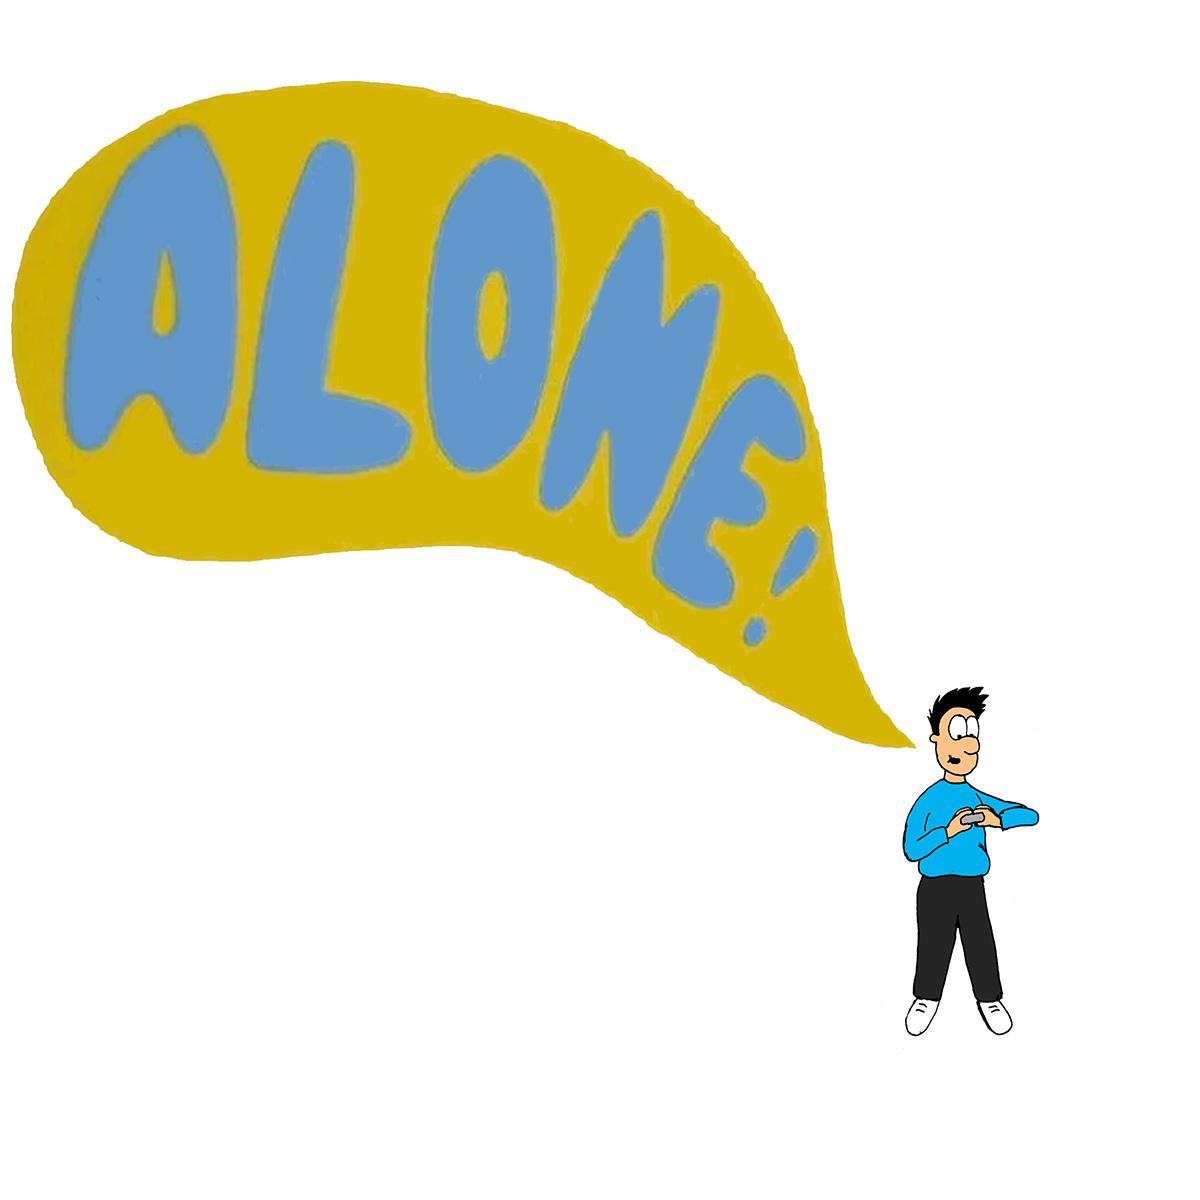 alone 4